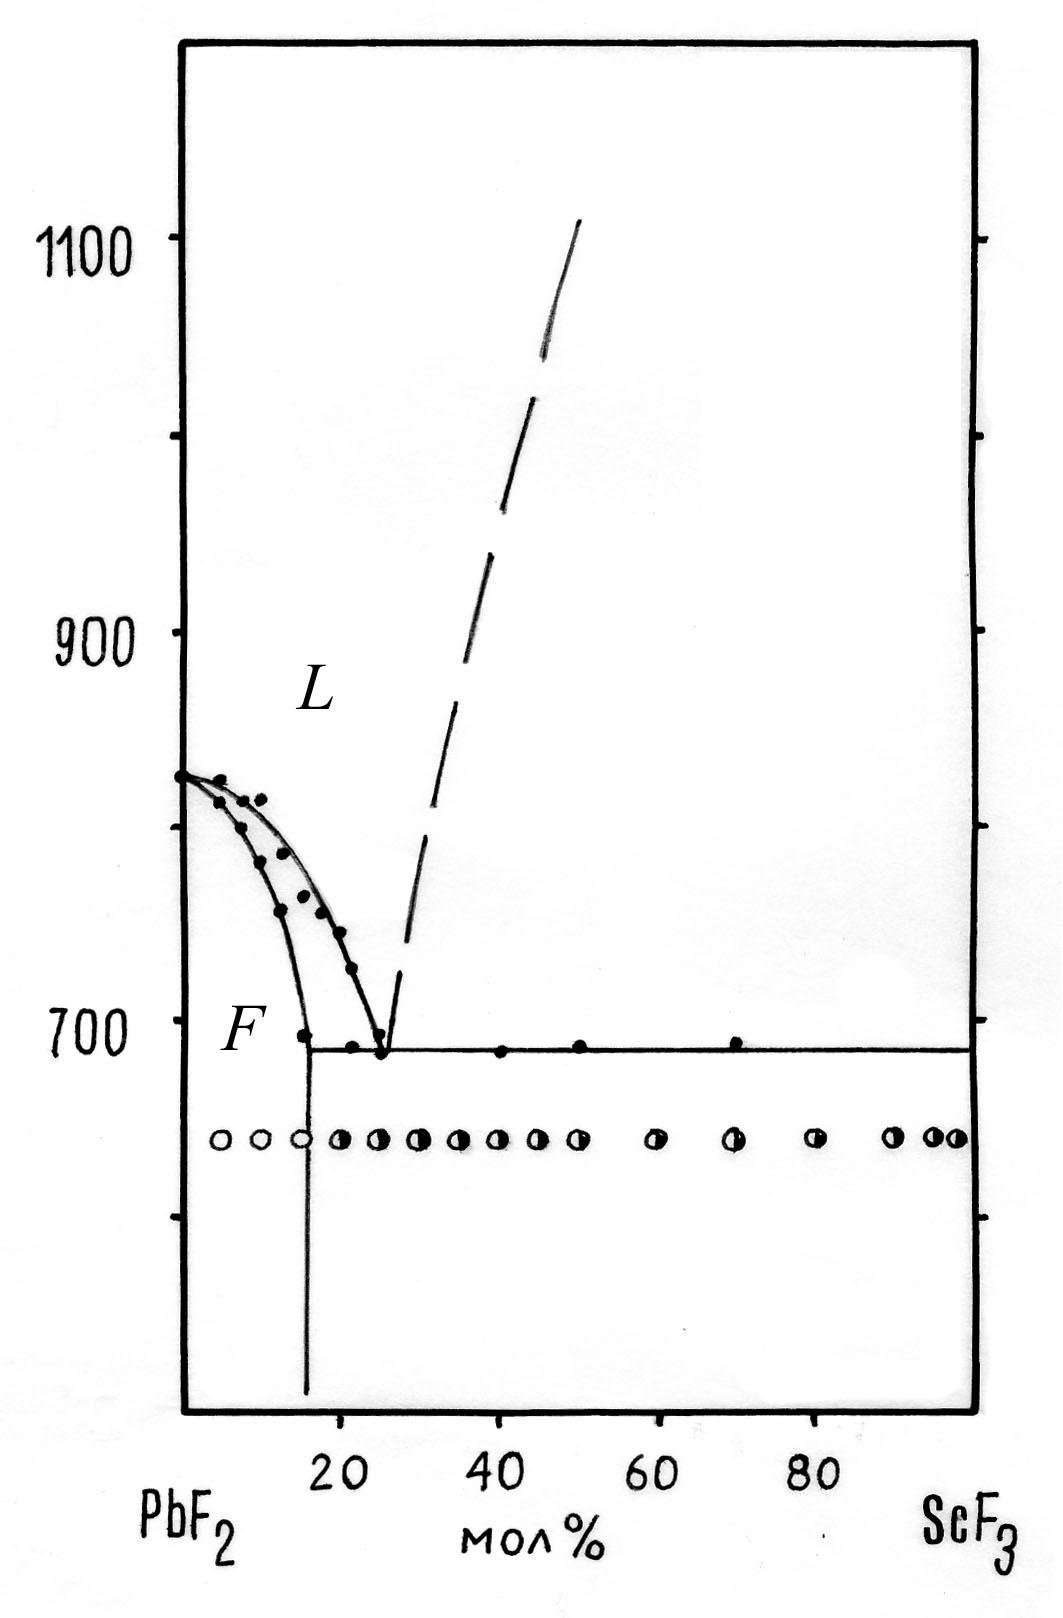 The system PbF2-ScF3